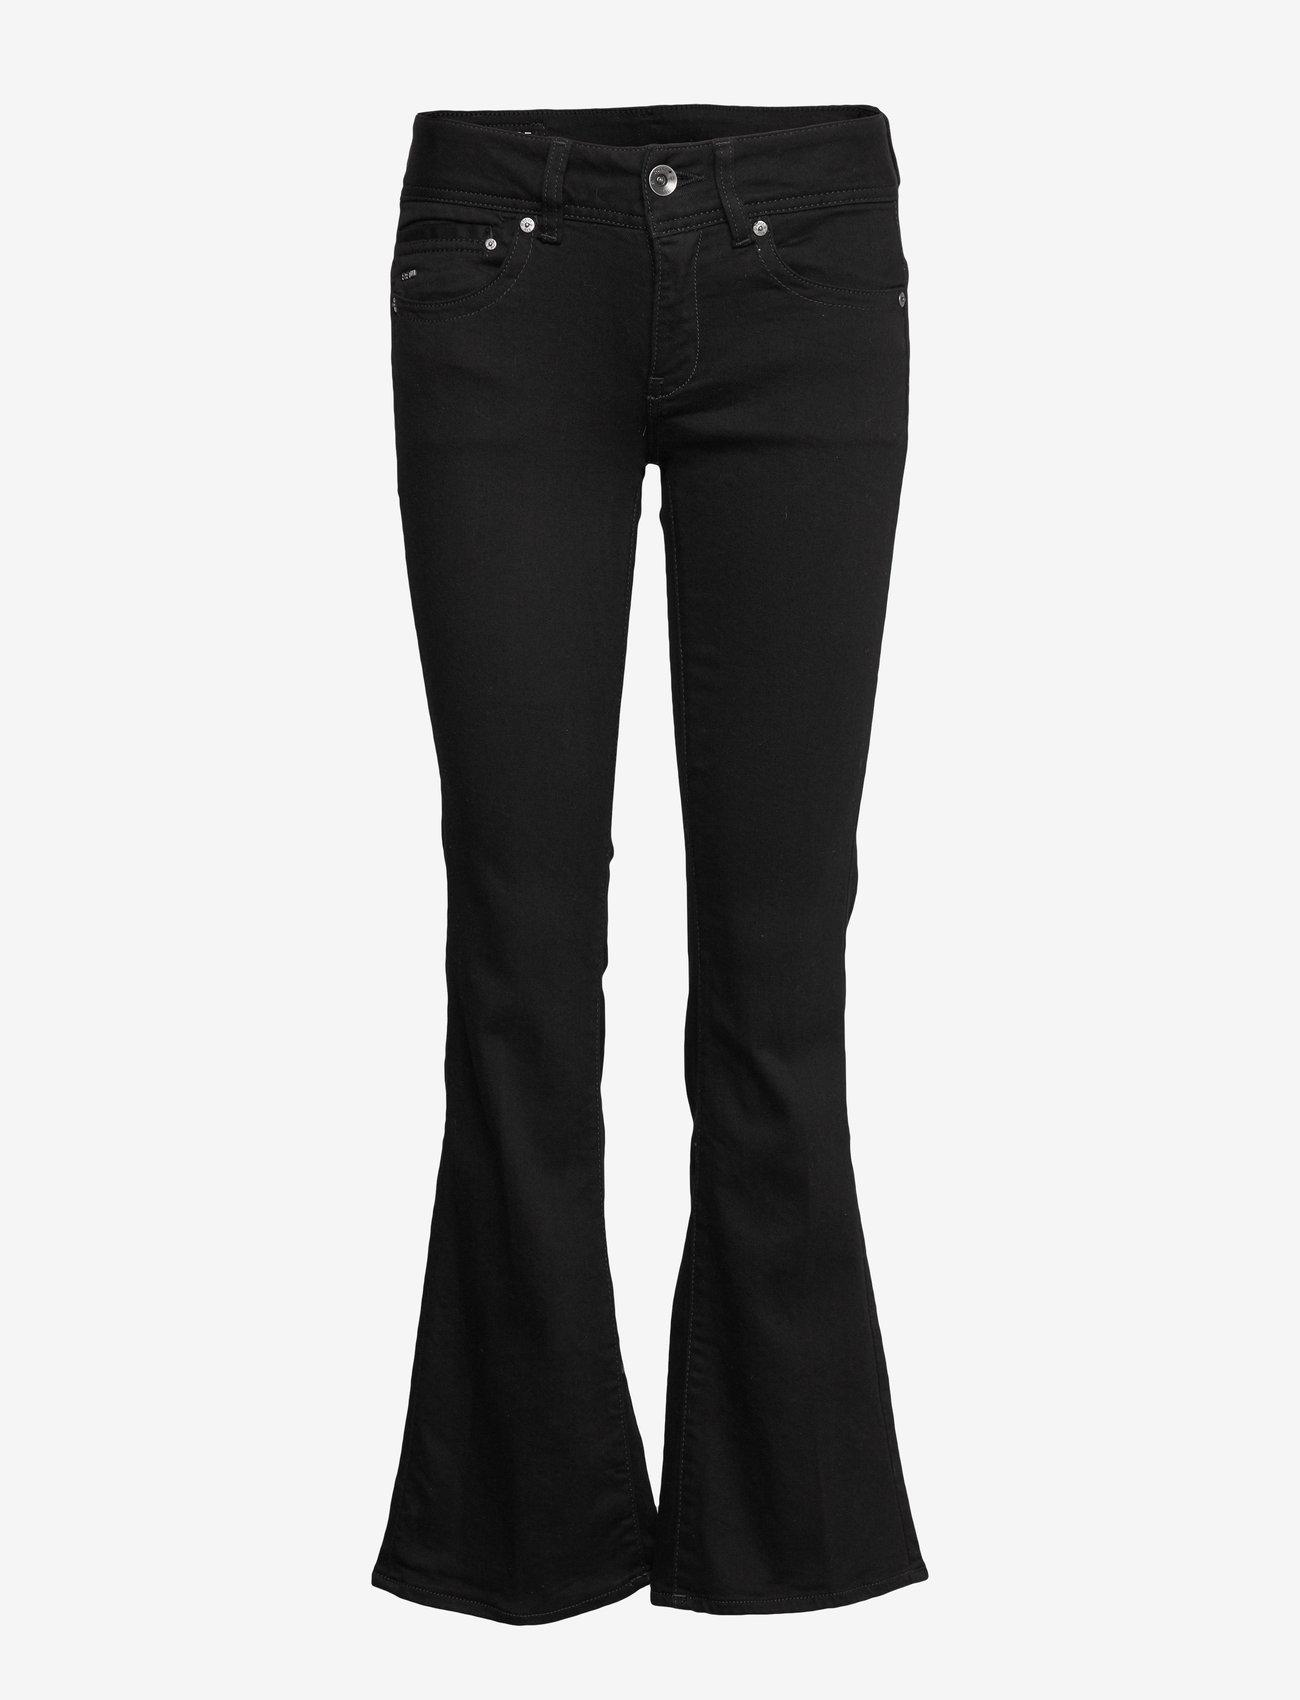 G-star RAW - Midge Mid Bootcut Wmn - bootcut jeans - pitch black - 0